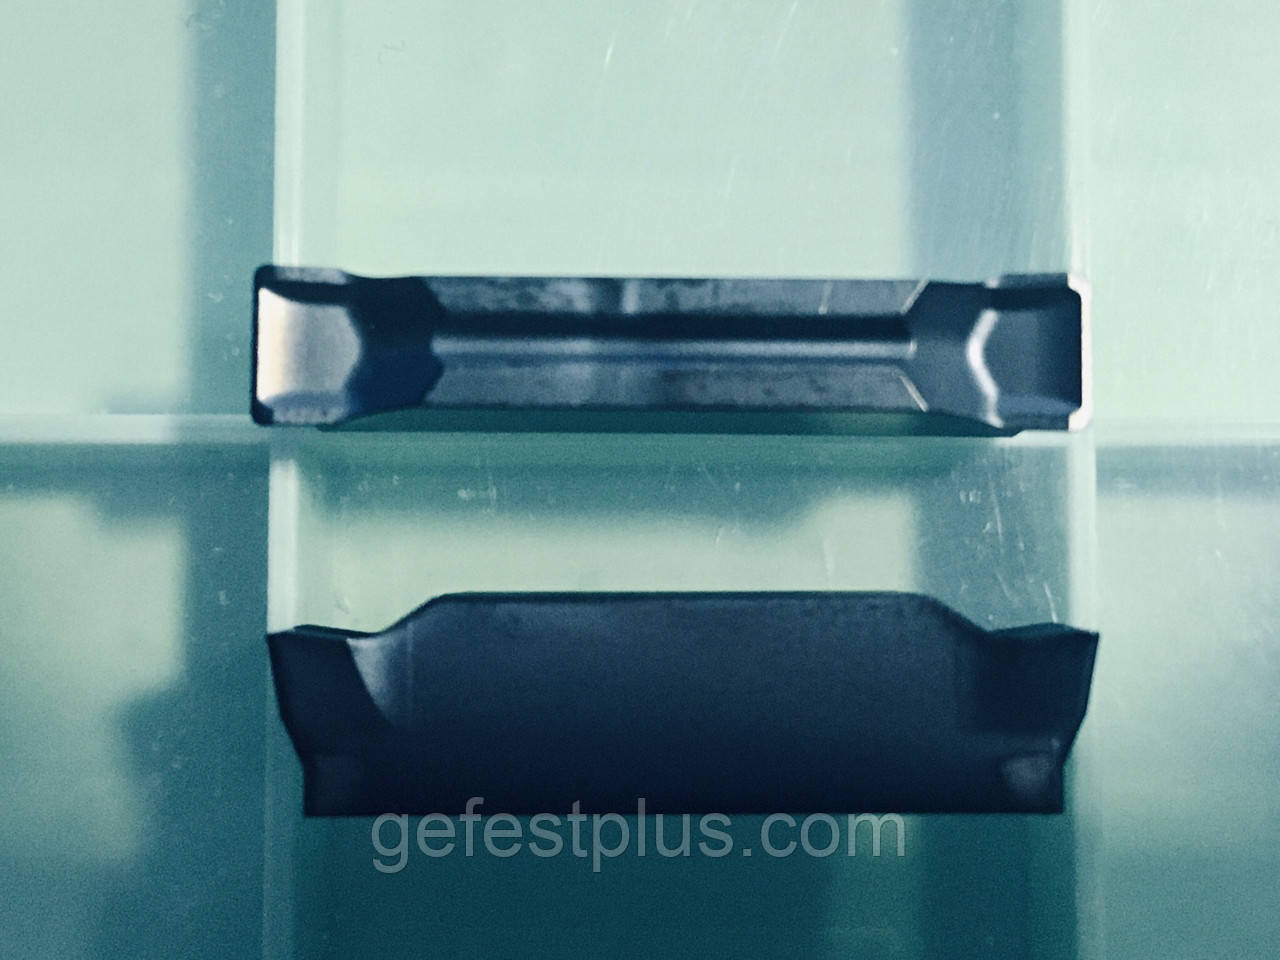 MGMN400-H P9035 Prospect Твердосплавная пластина для токарного резца